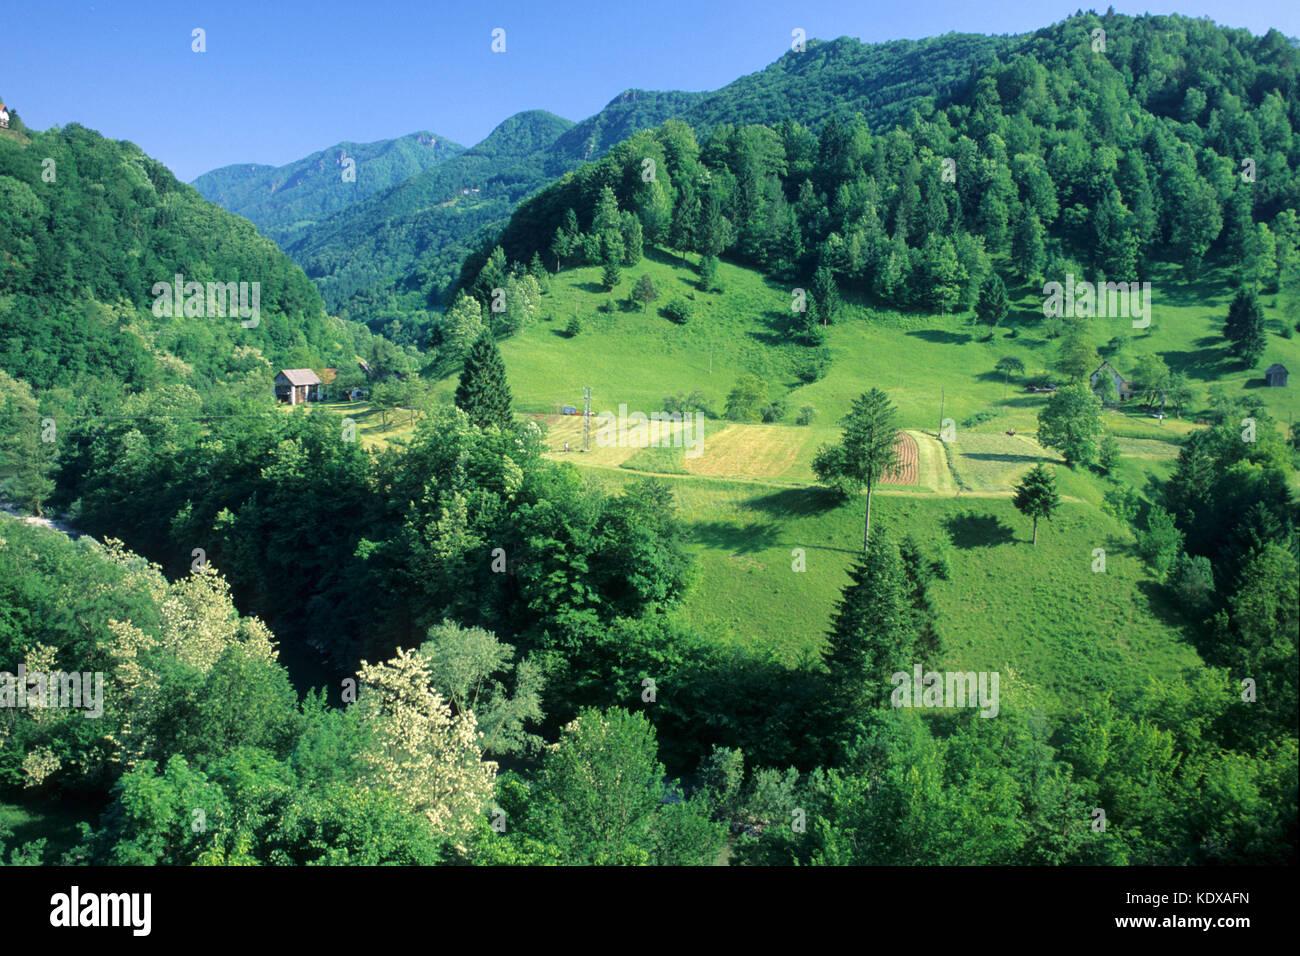 Slowenien, Brezice, Hügelland Kozjansko nördlich von Brezice - Stock Image